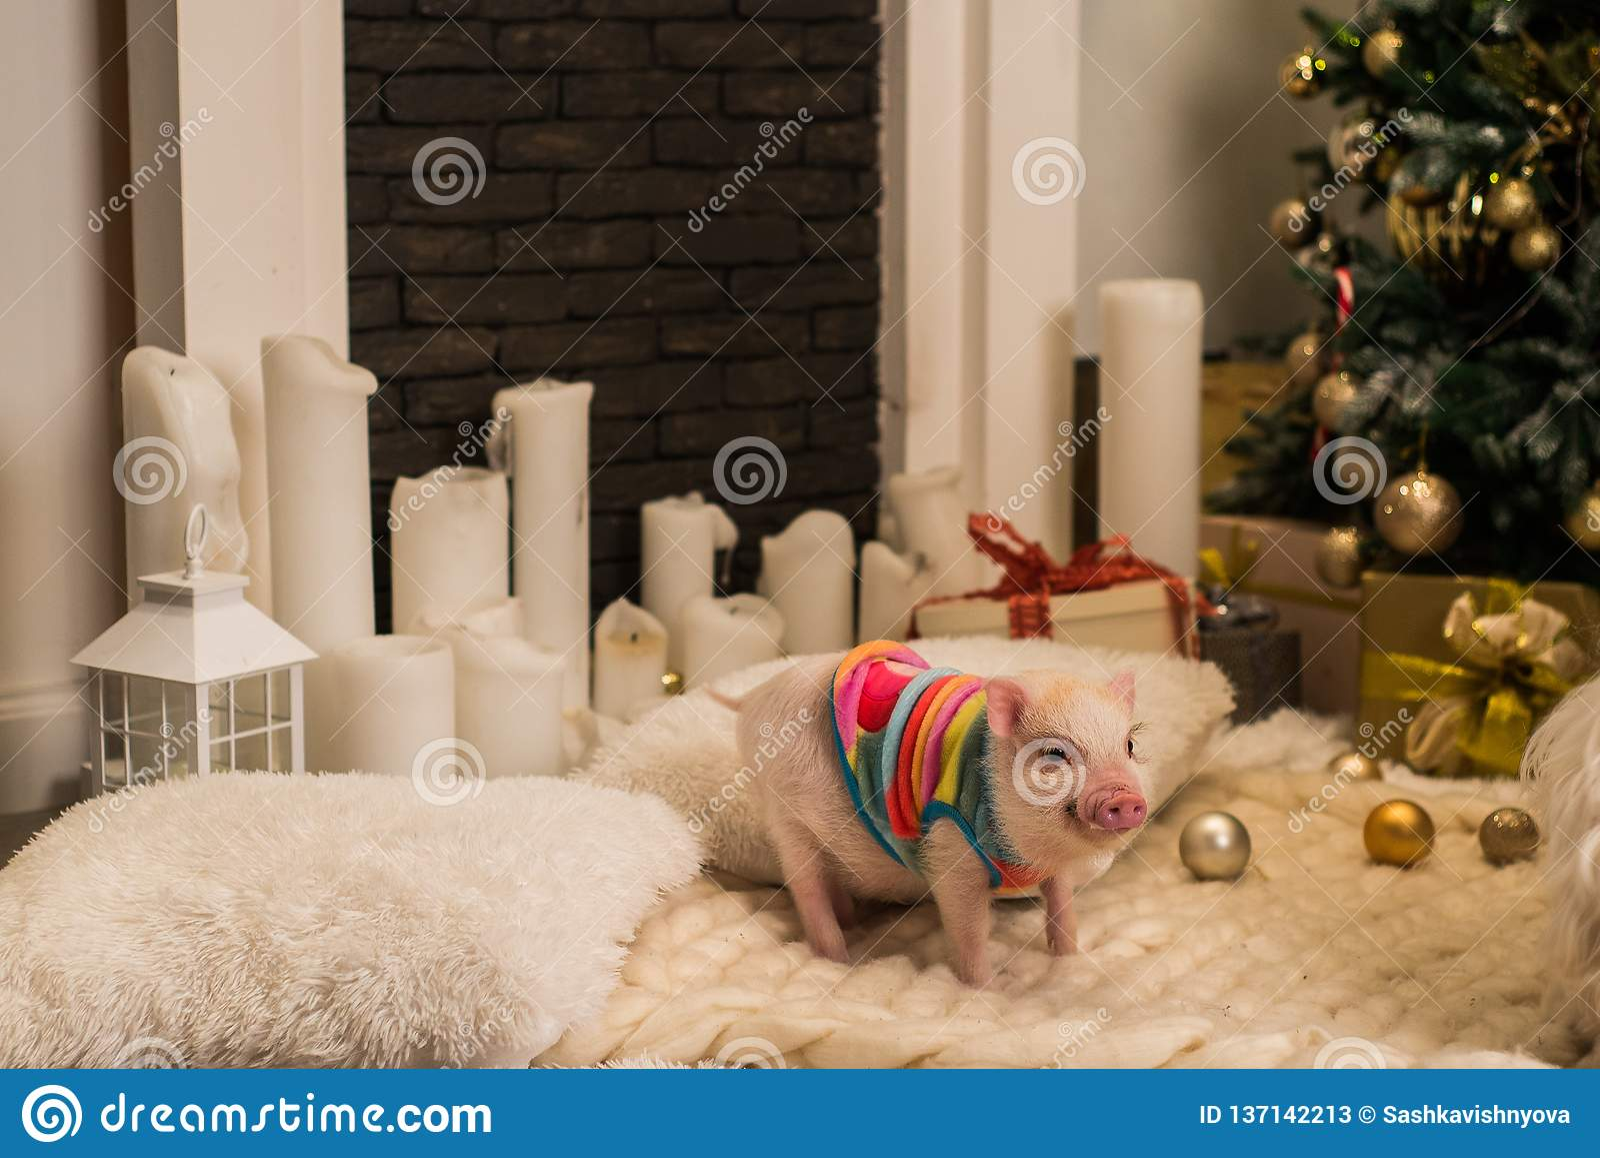 Cute pink mini pig indoors